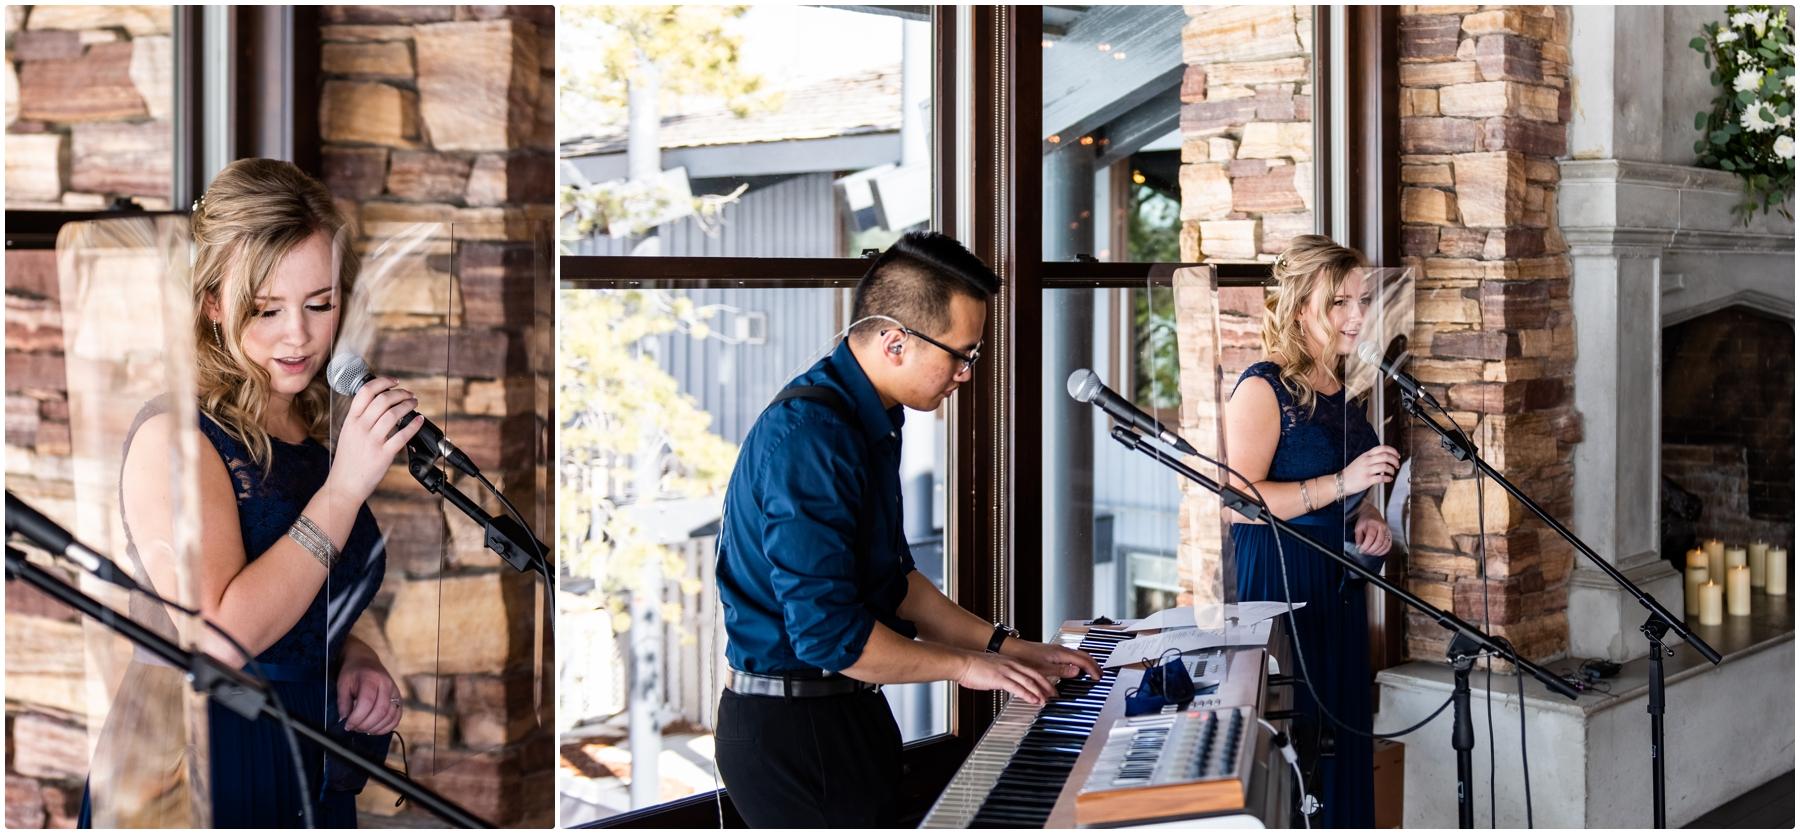 Calgary Wedding Photography - The Lake House Restaurant